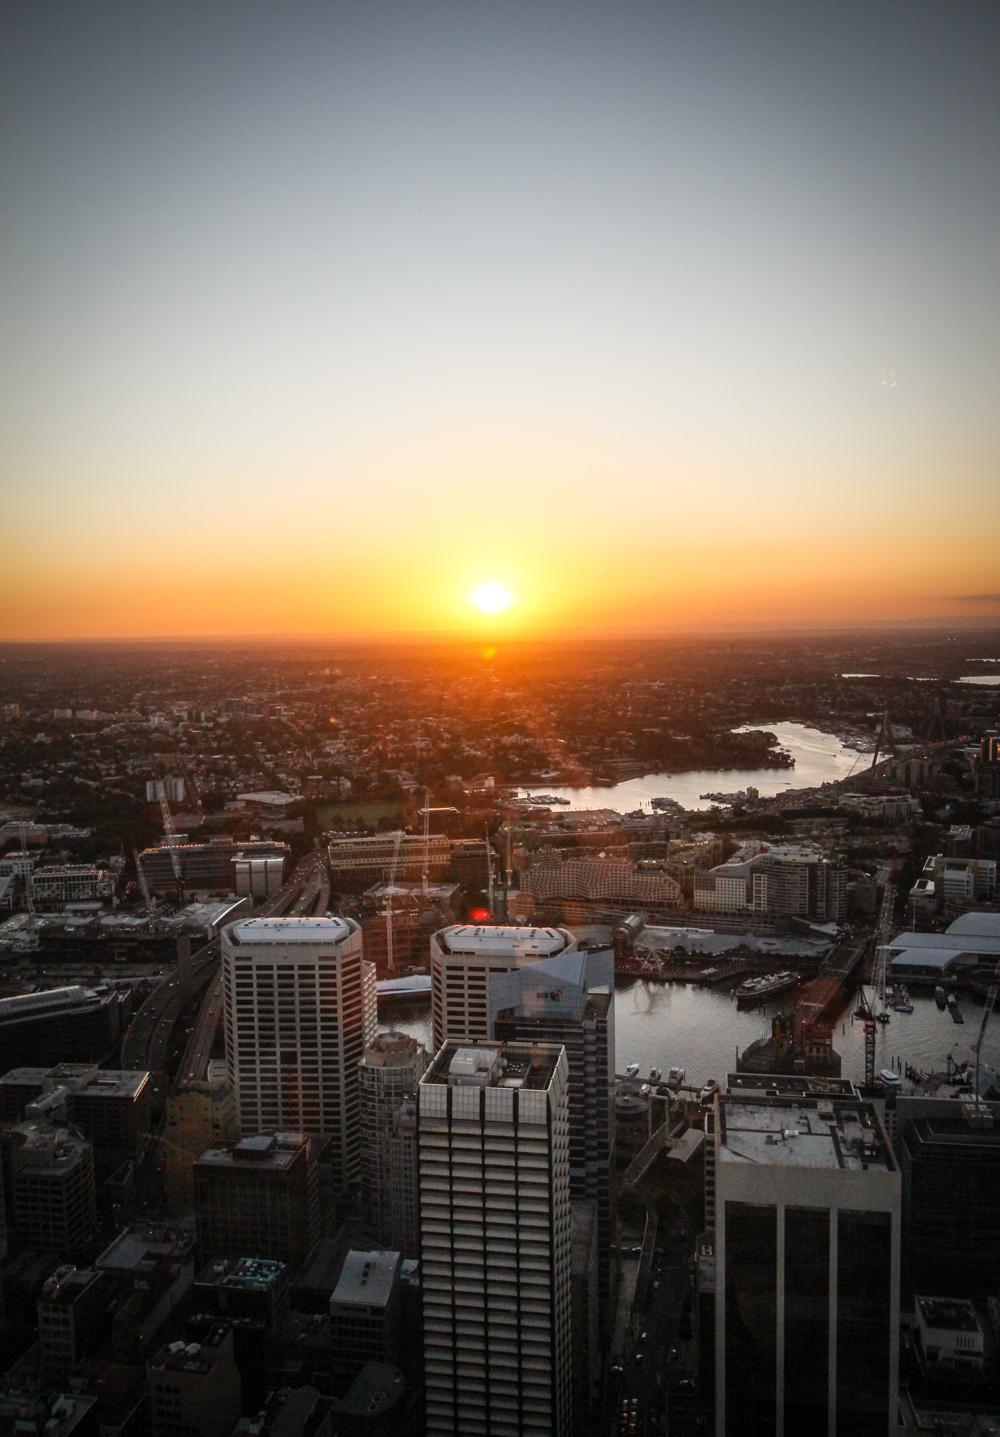 Sydney Australia | How Far From Home